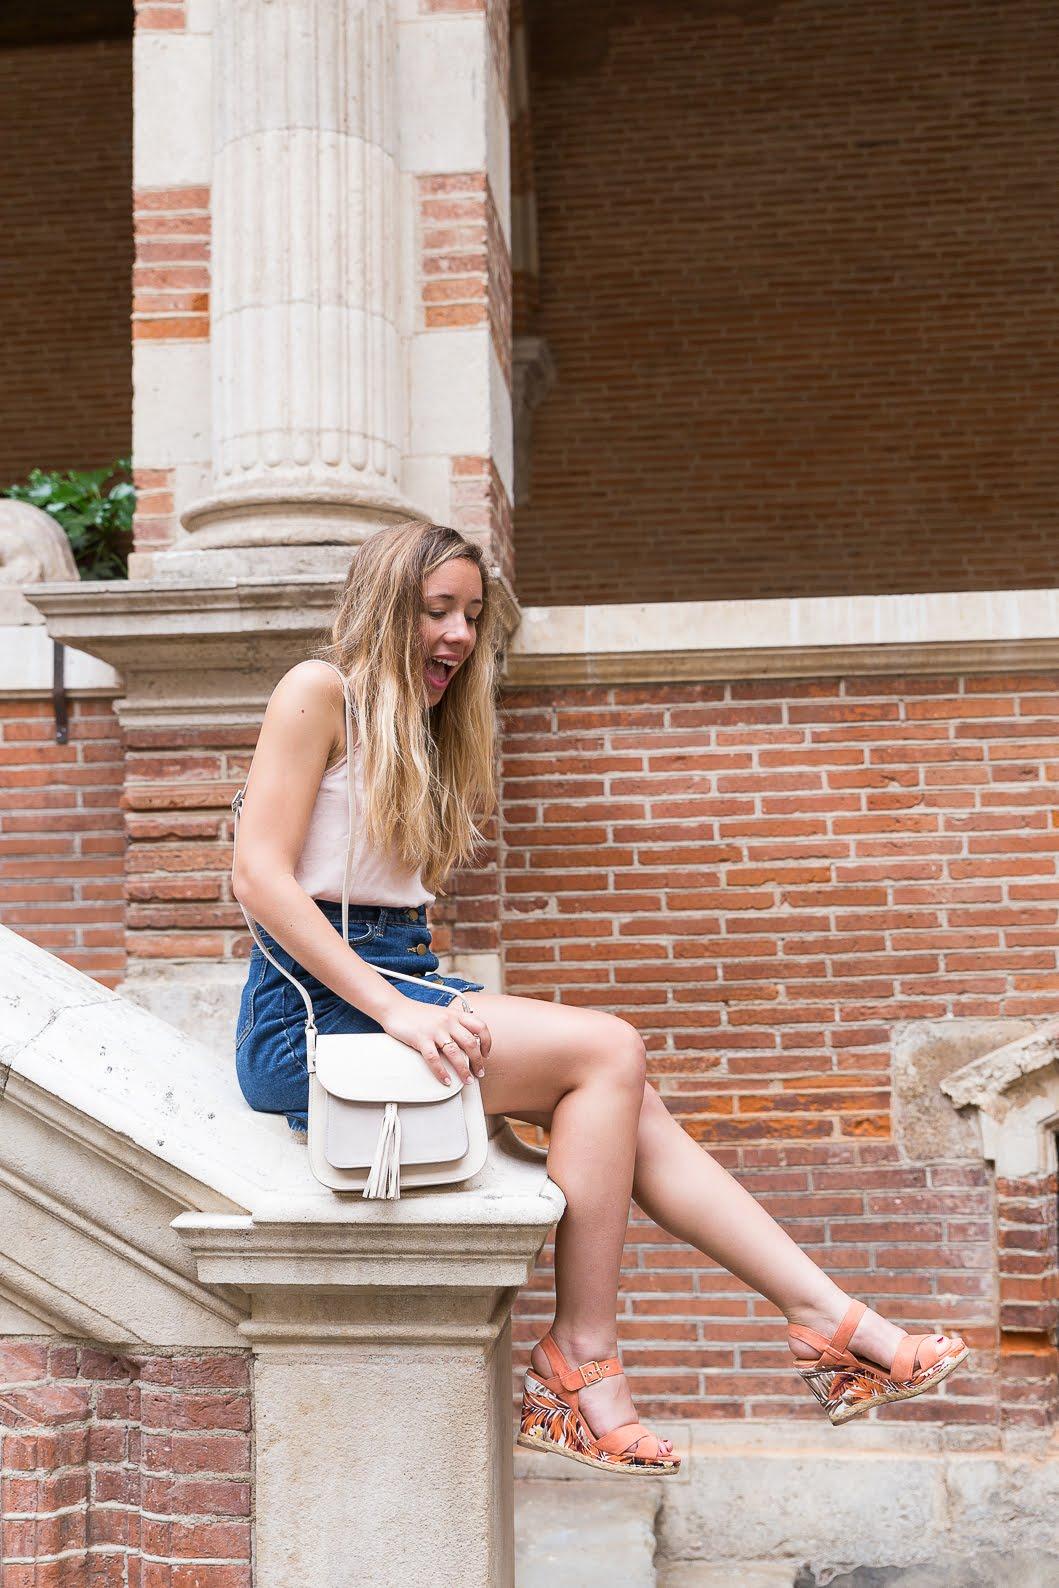 Blog mode lifestyle bonne humeur